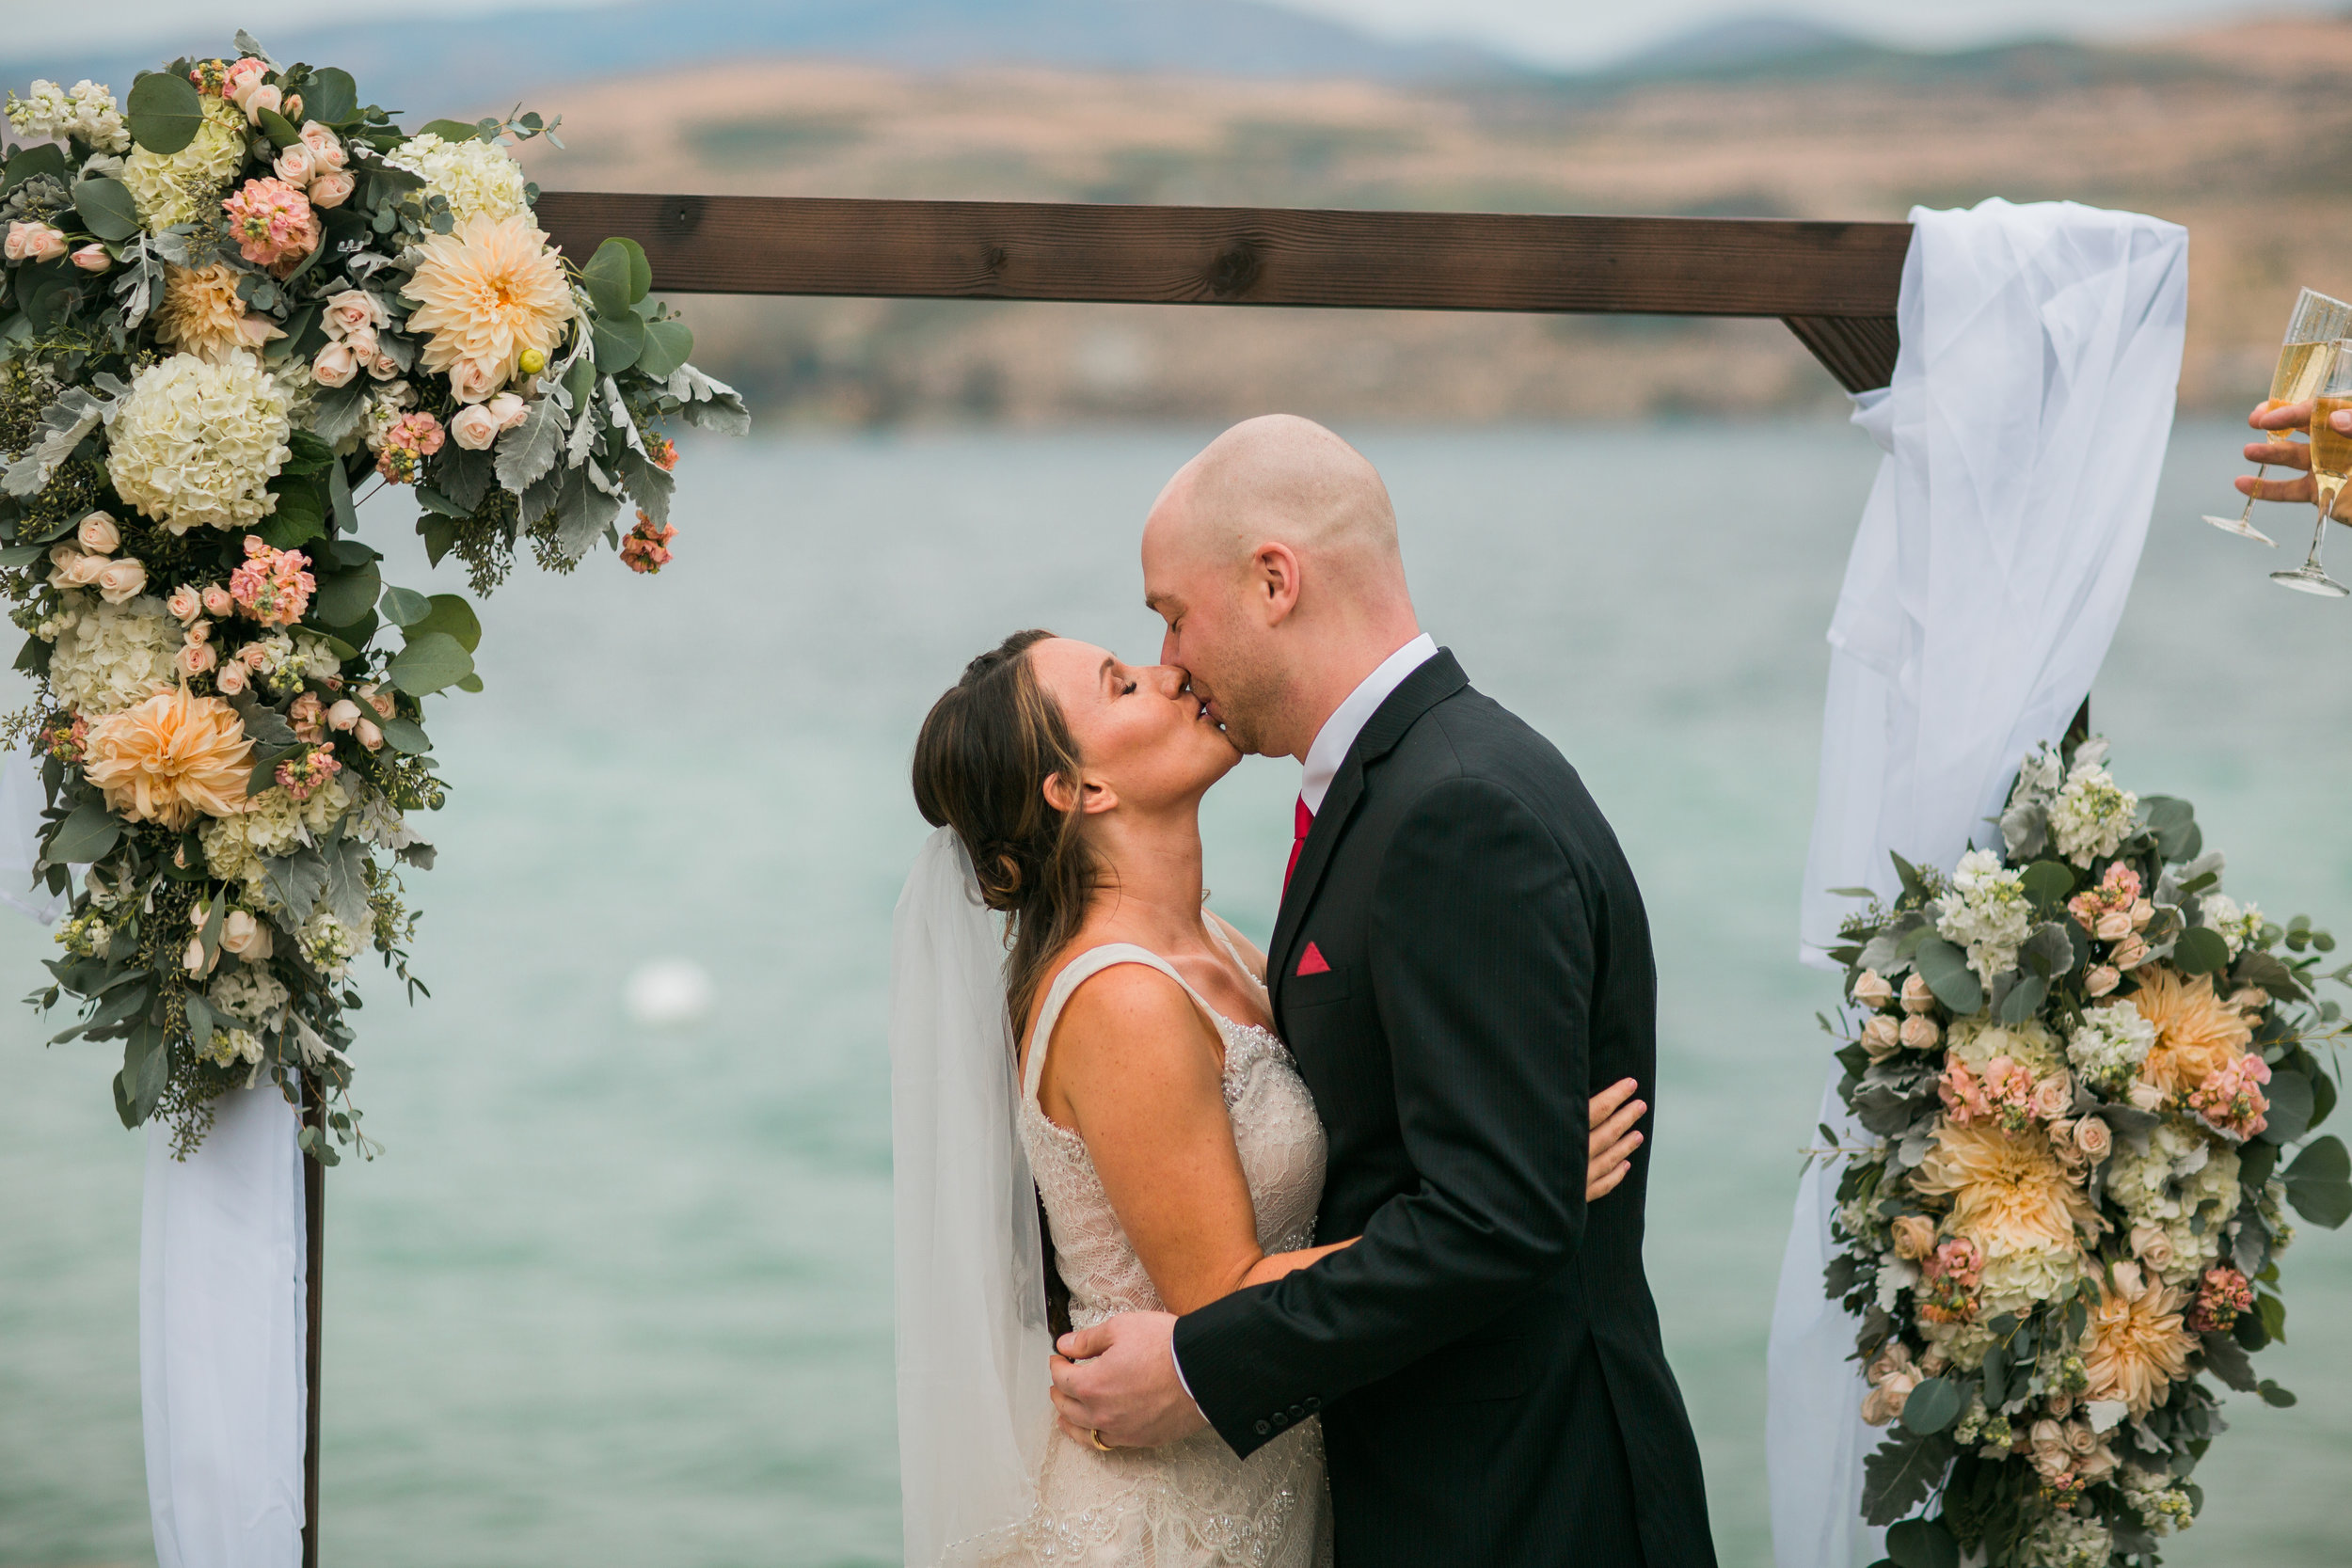 Lake Chelan, WA Wedding | Emily Eliza Photo & Design